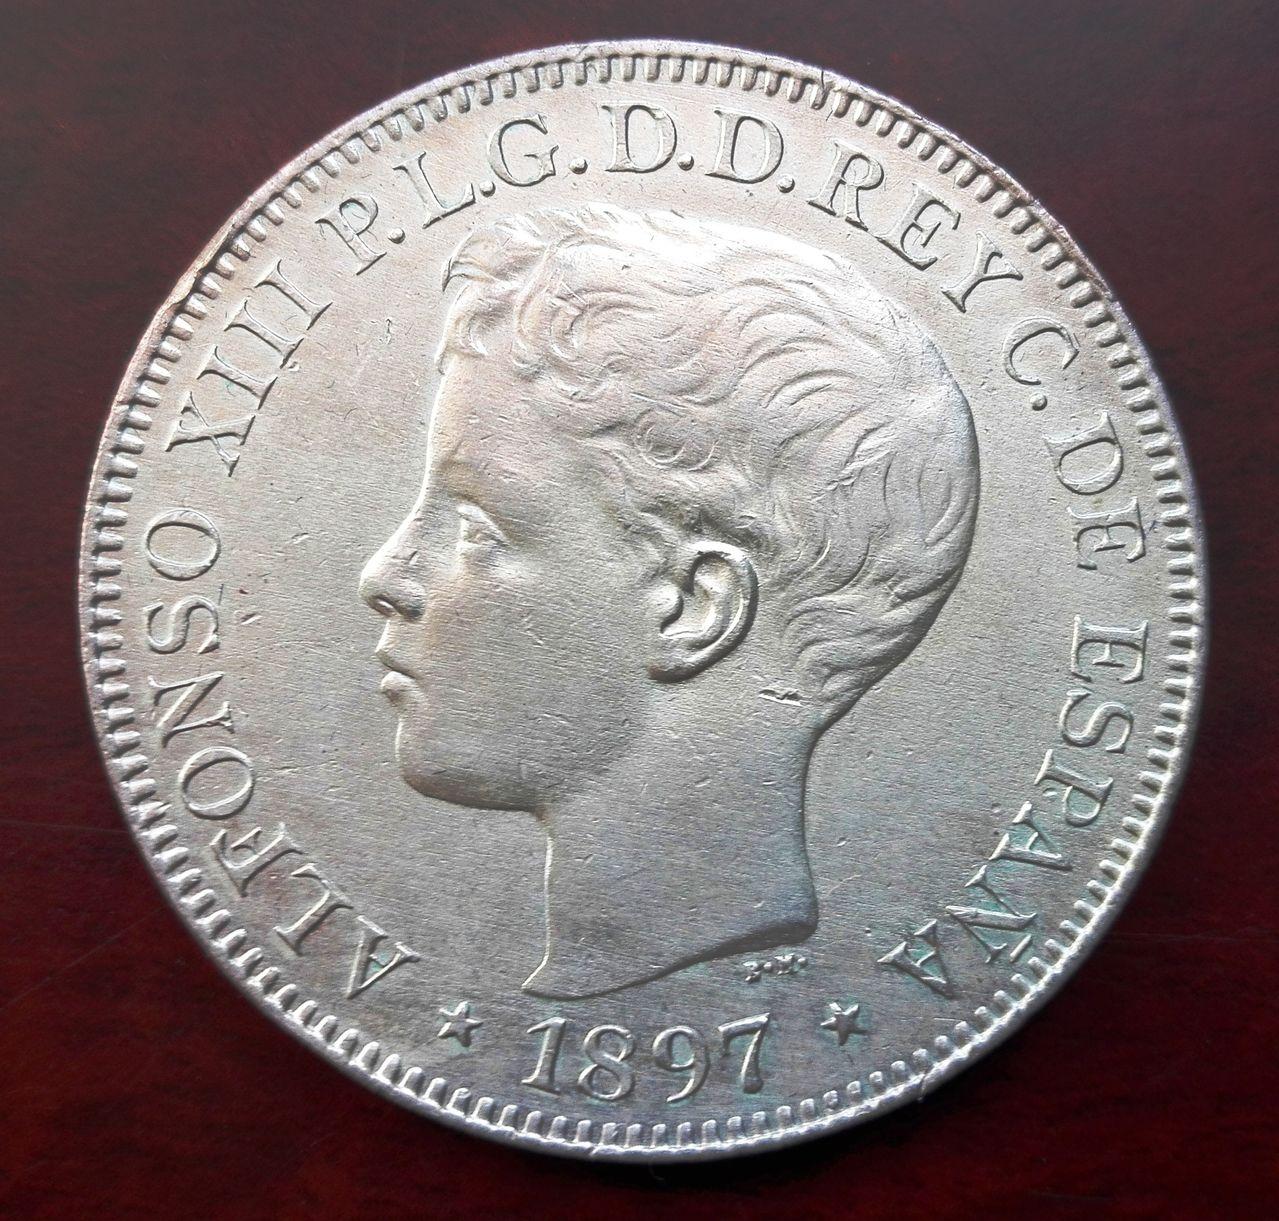 1 peso Filipinas 1897, Alfonso XIII  1_peso_fiolipnas